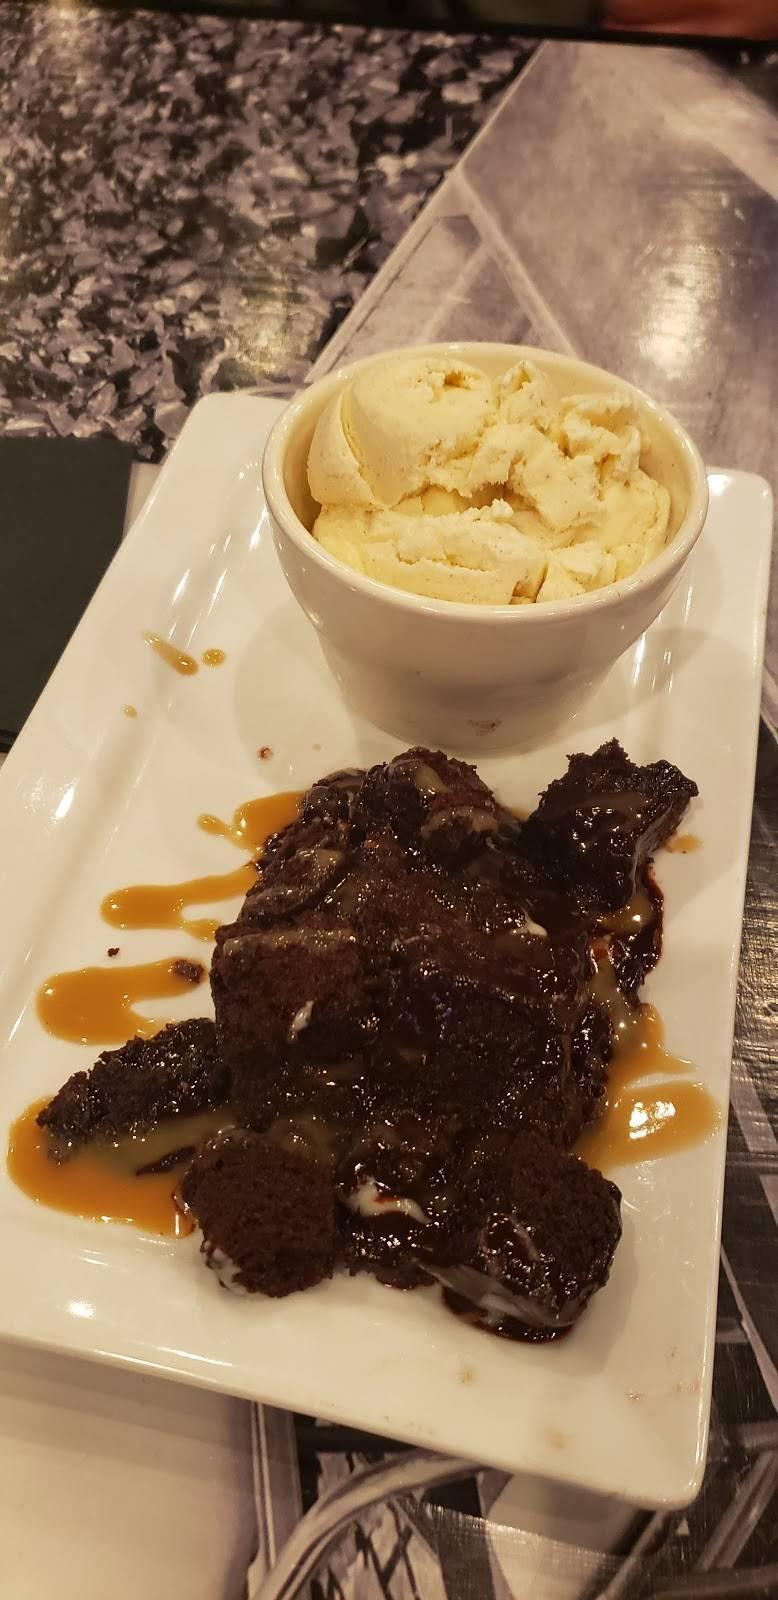 Dixie Blues   restaurant   345 Amherst St, Nashua, NH 03063, USA   6034176909 OR +1 603-417-6909